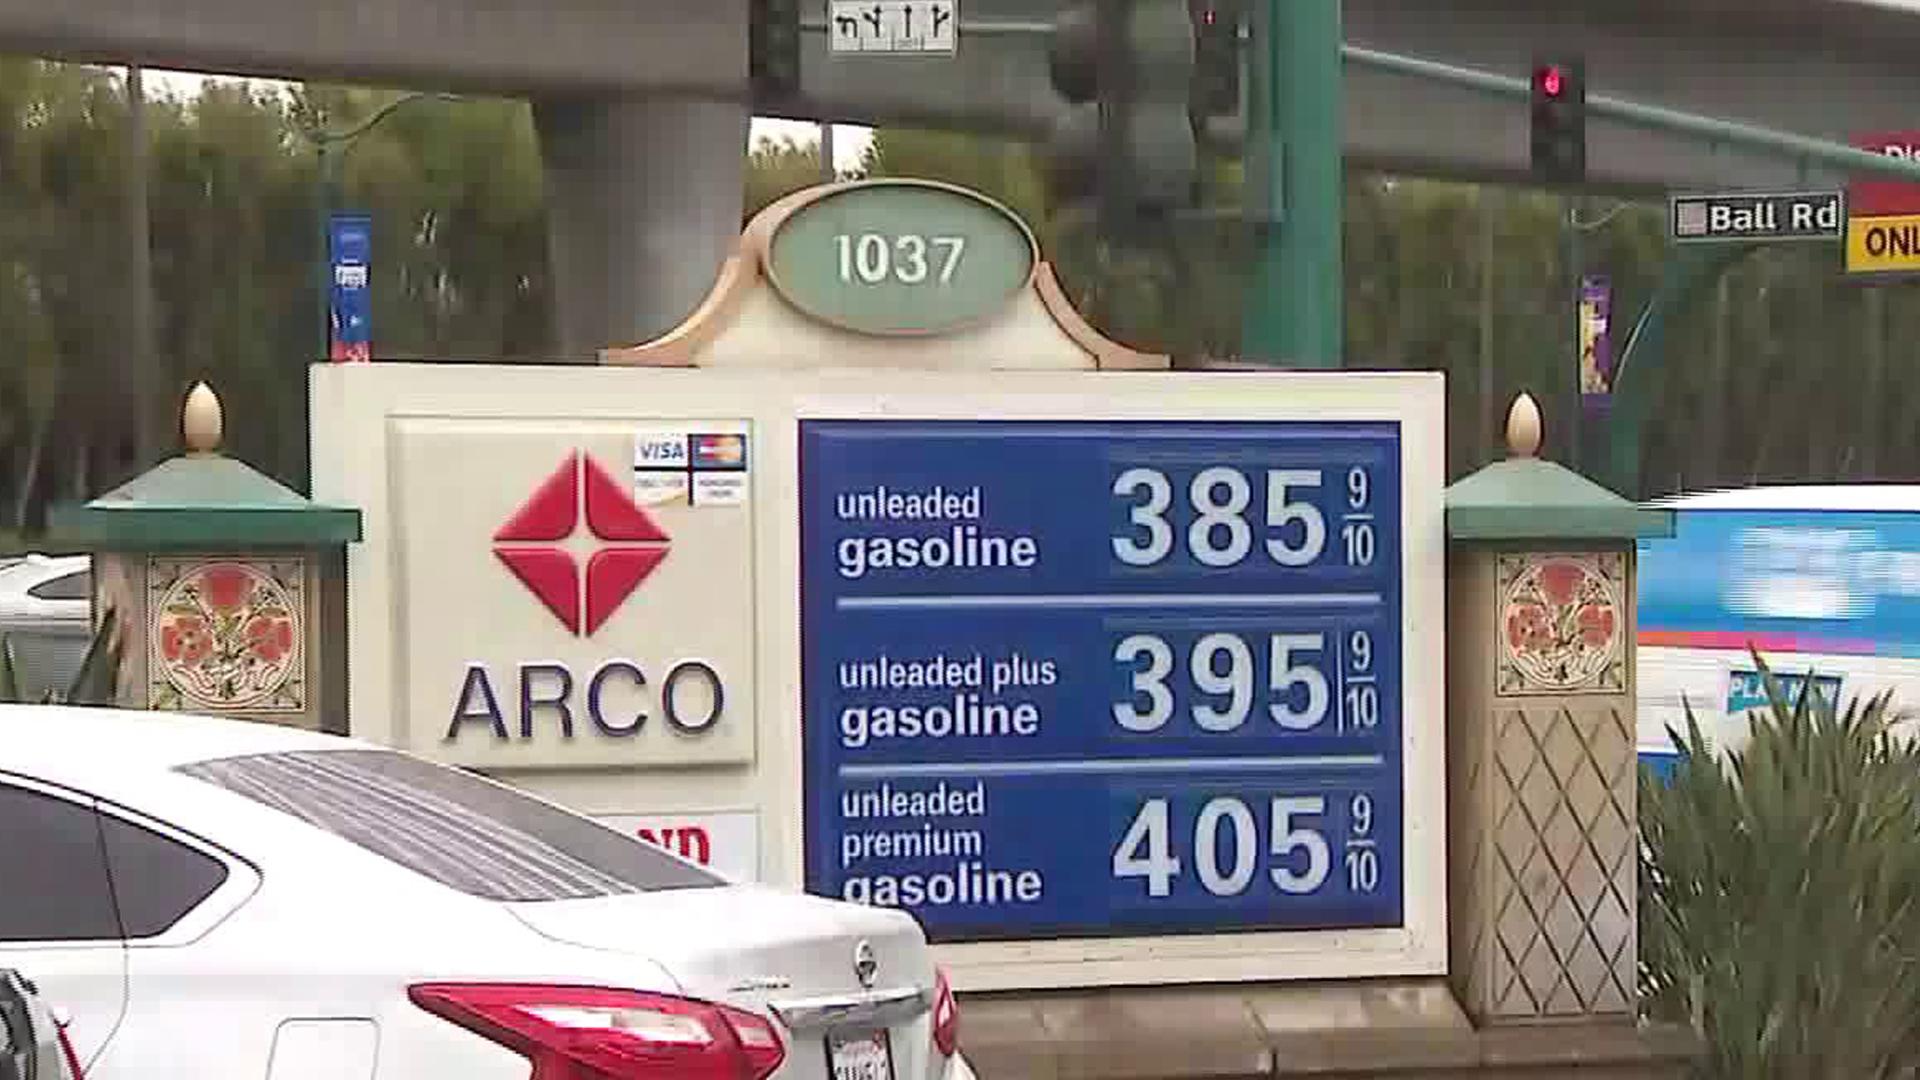 An Arco gas station sign near Disneyland on May 24, 2018. (Credit: KTLA)